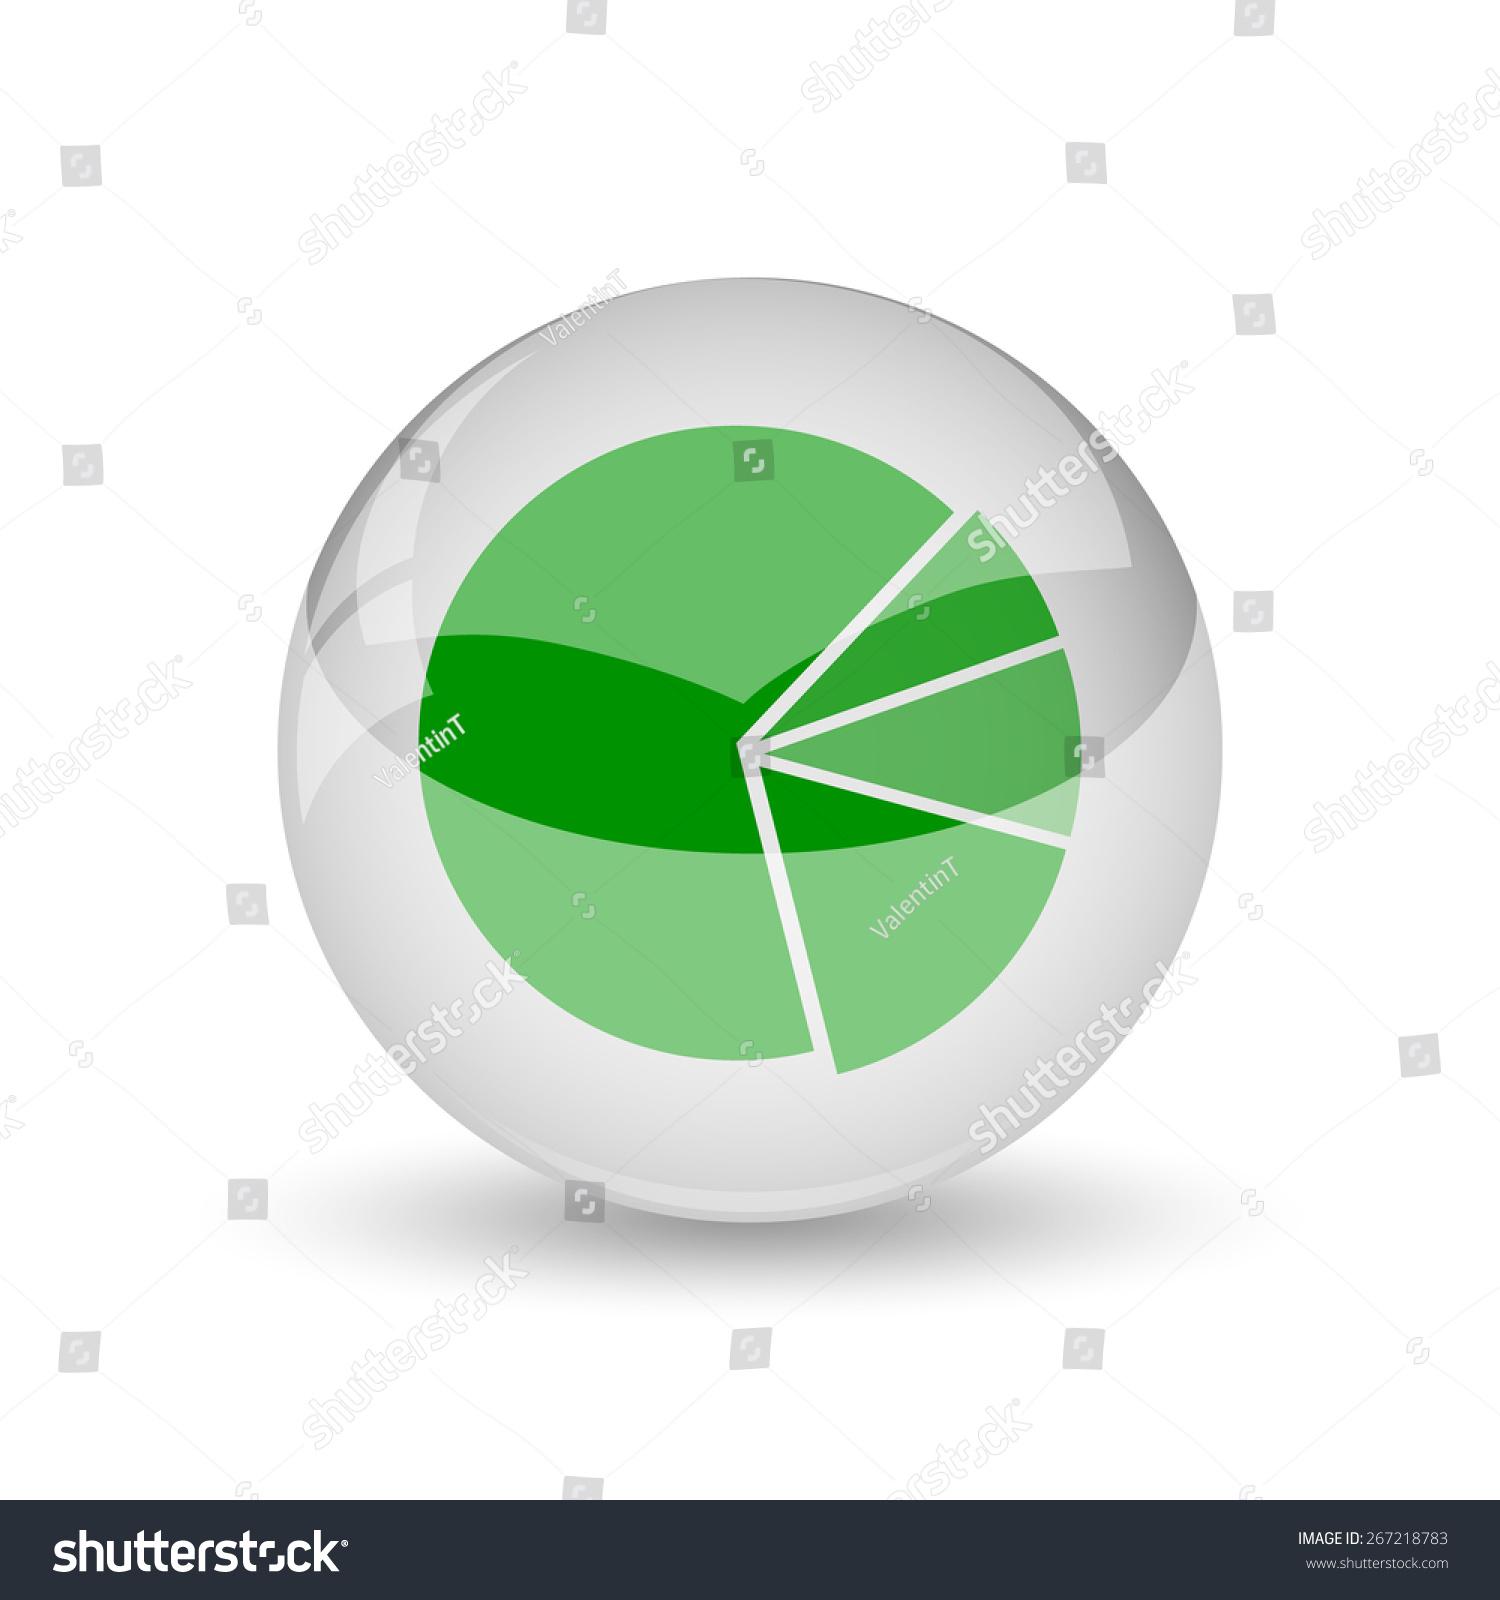 Chart Pie Icon Internet Button On Stock Illustration 267218783